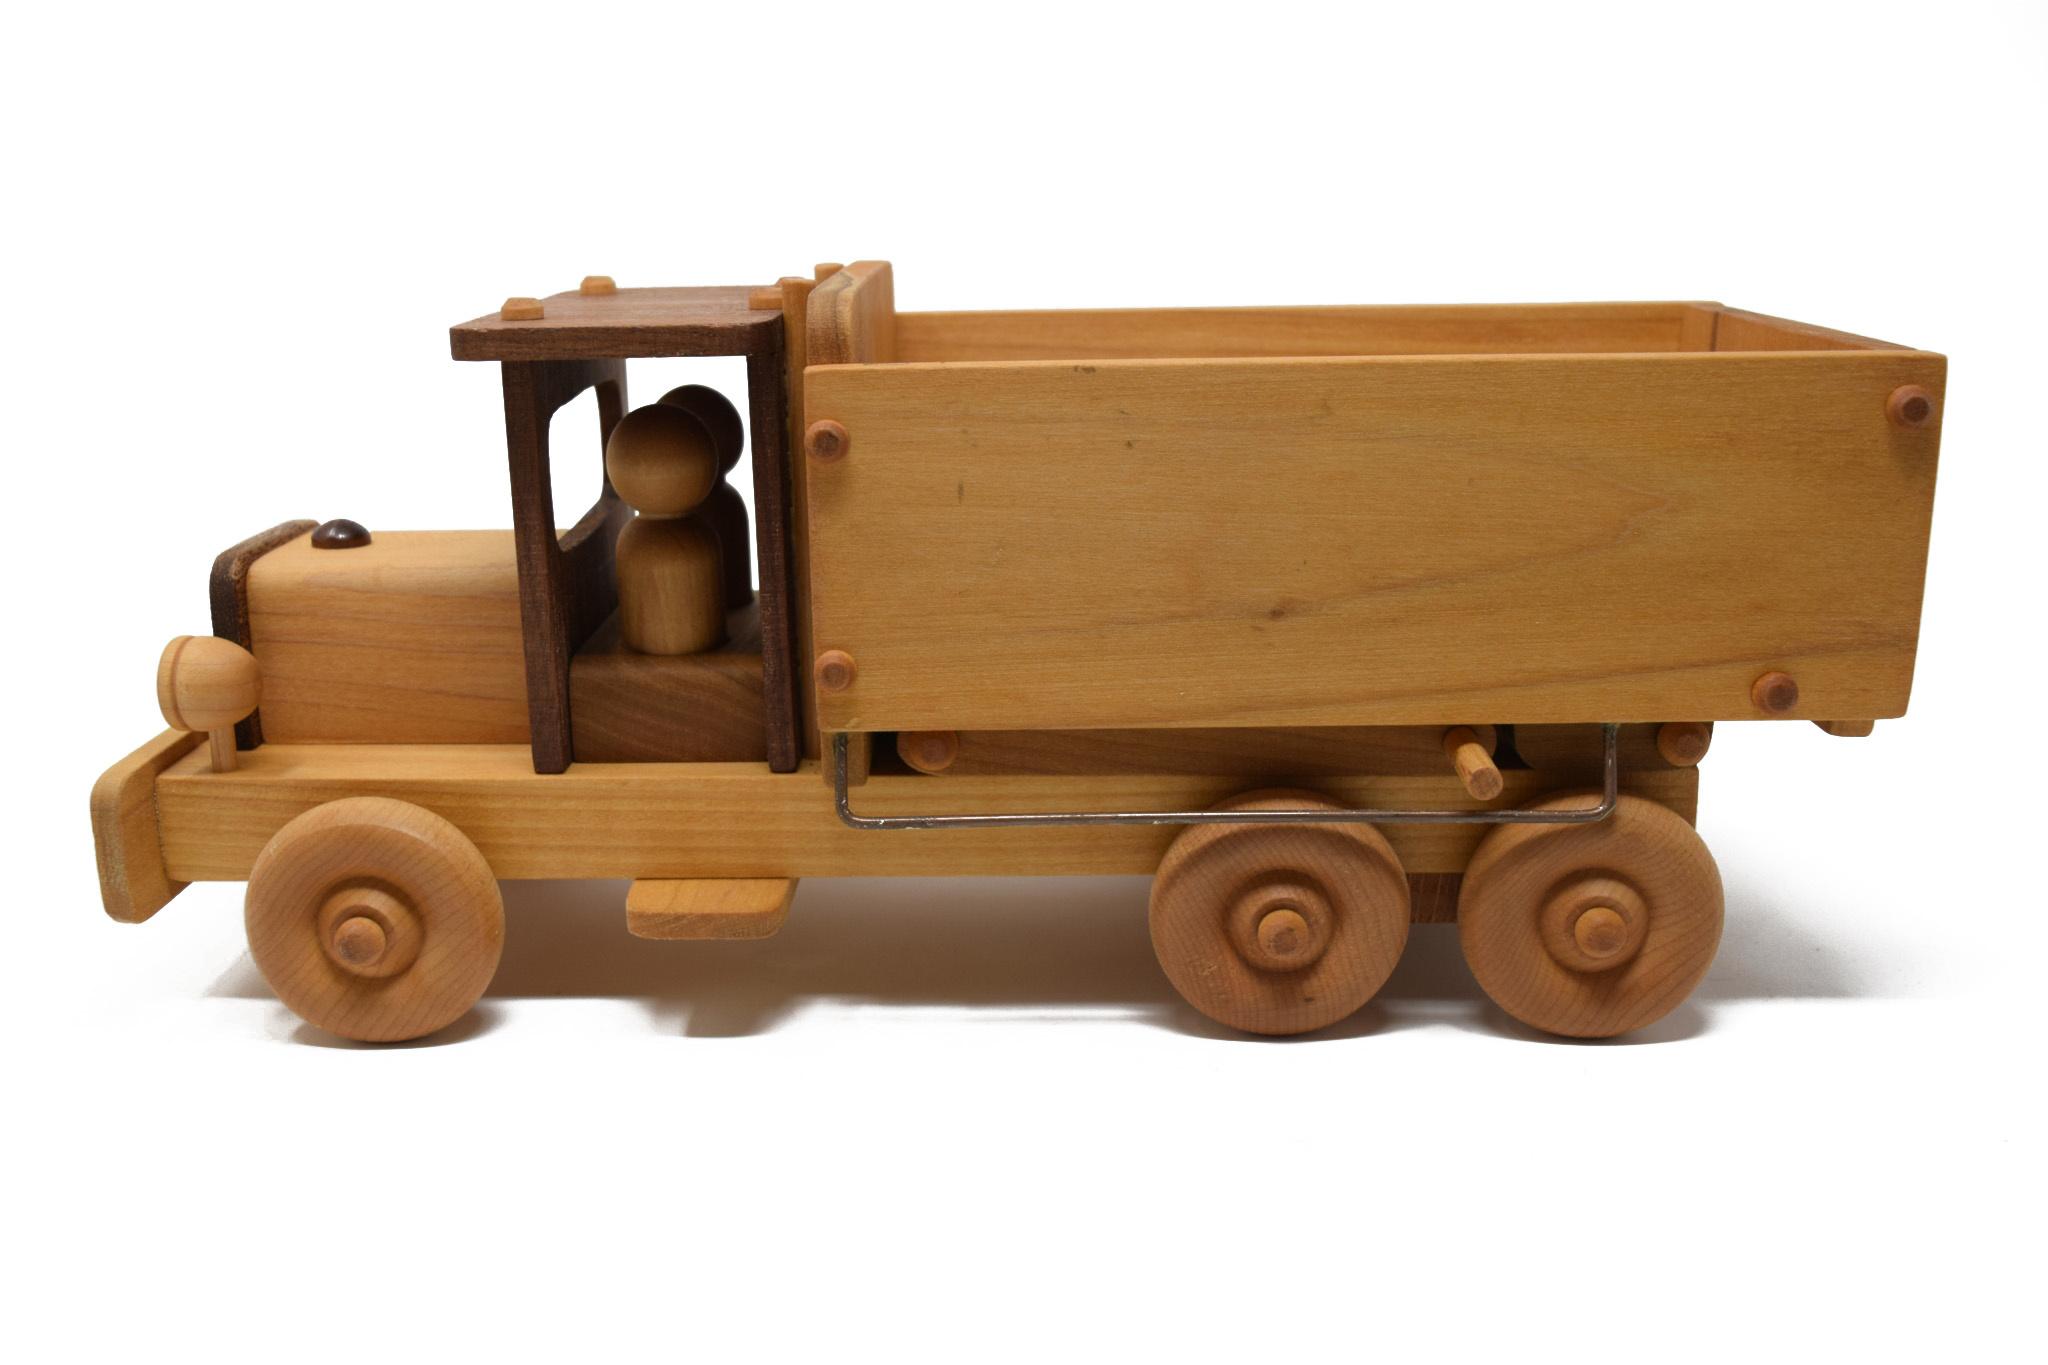 Wooden Dump Truck Toy-2